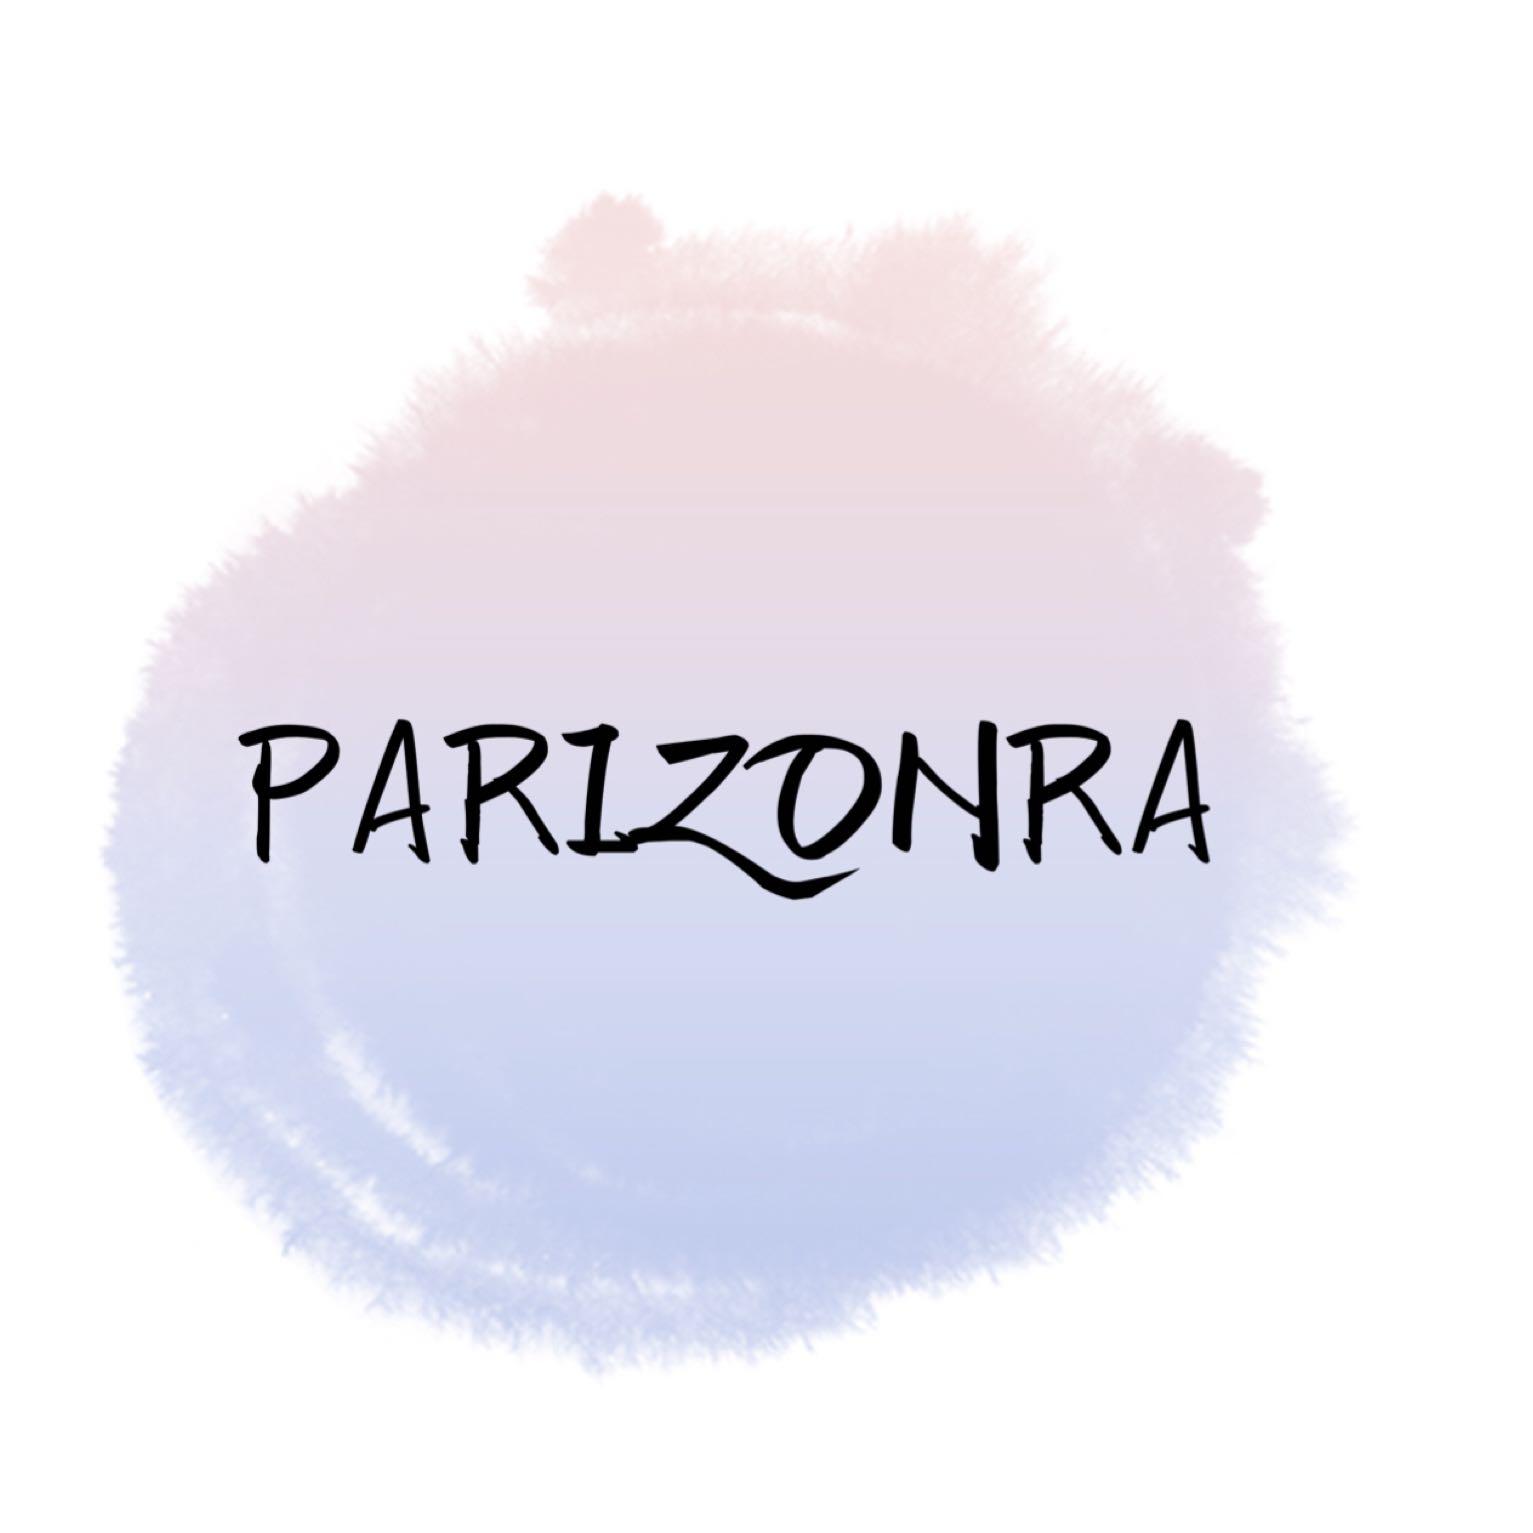 parizonra